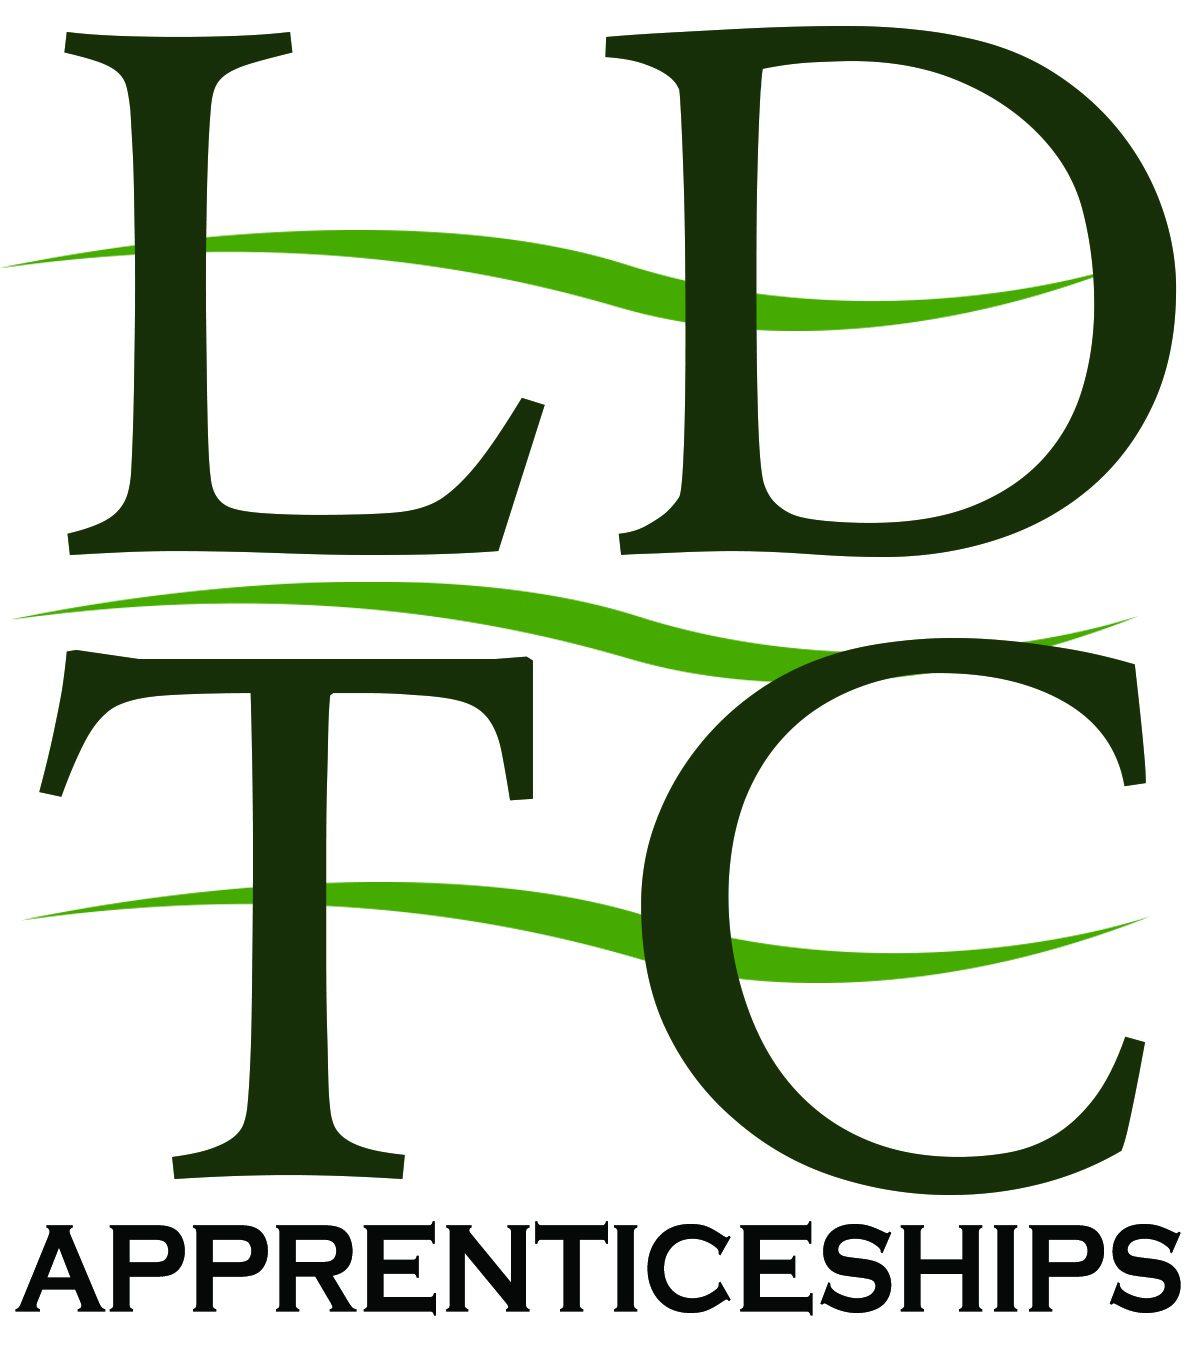 Apprenticeships_Logo - Lake Dillon Theatre throughout Nyc Board Of Education Calendar 2022